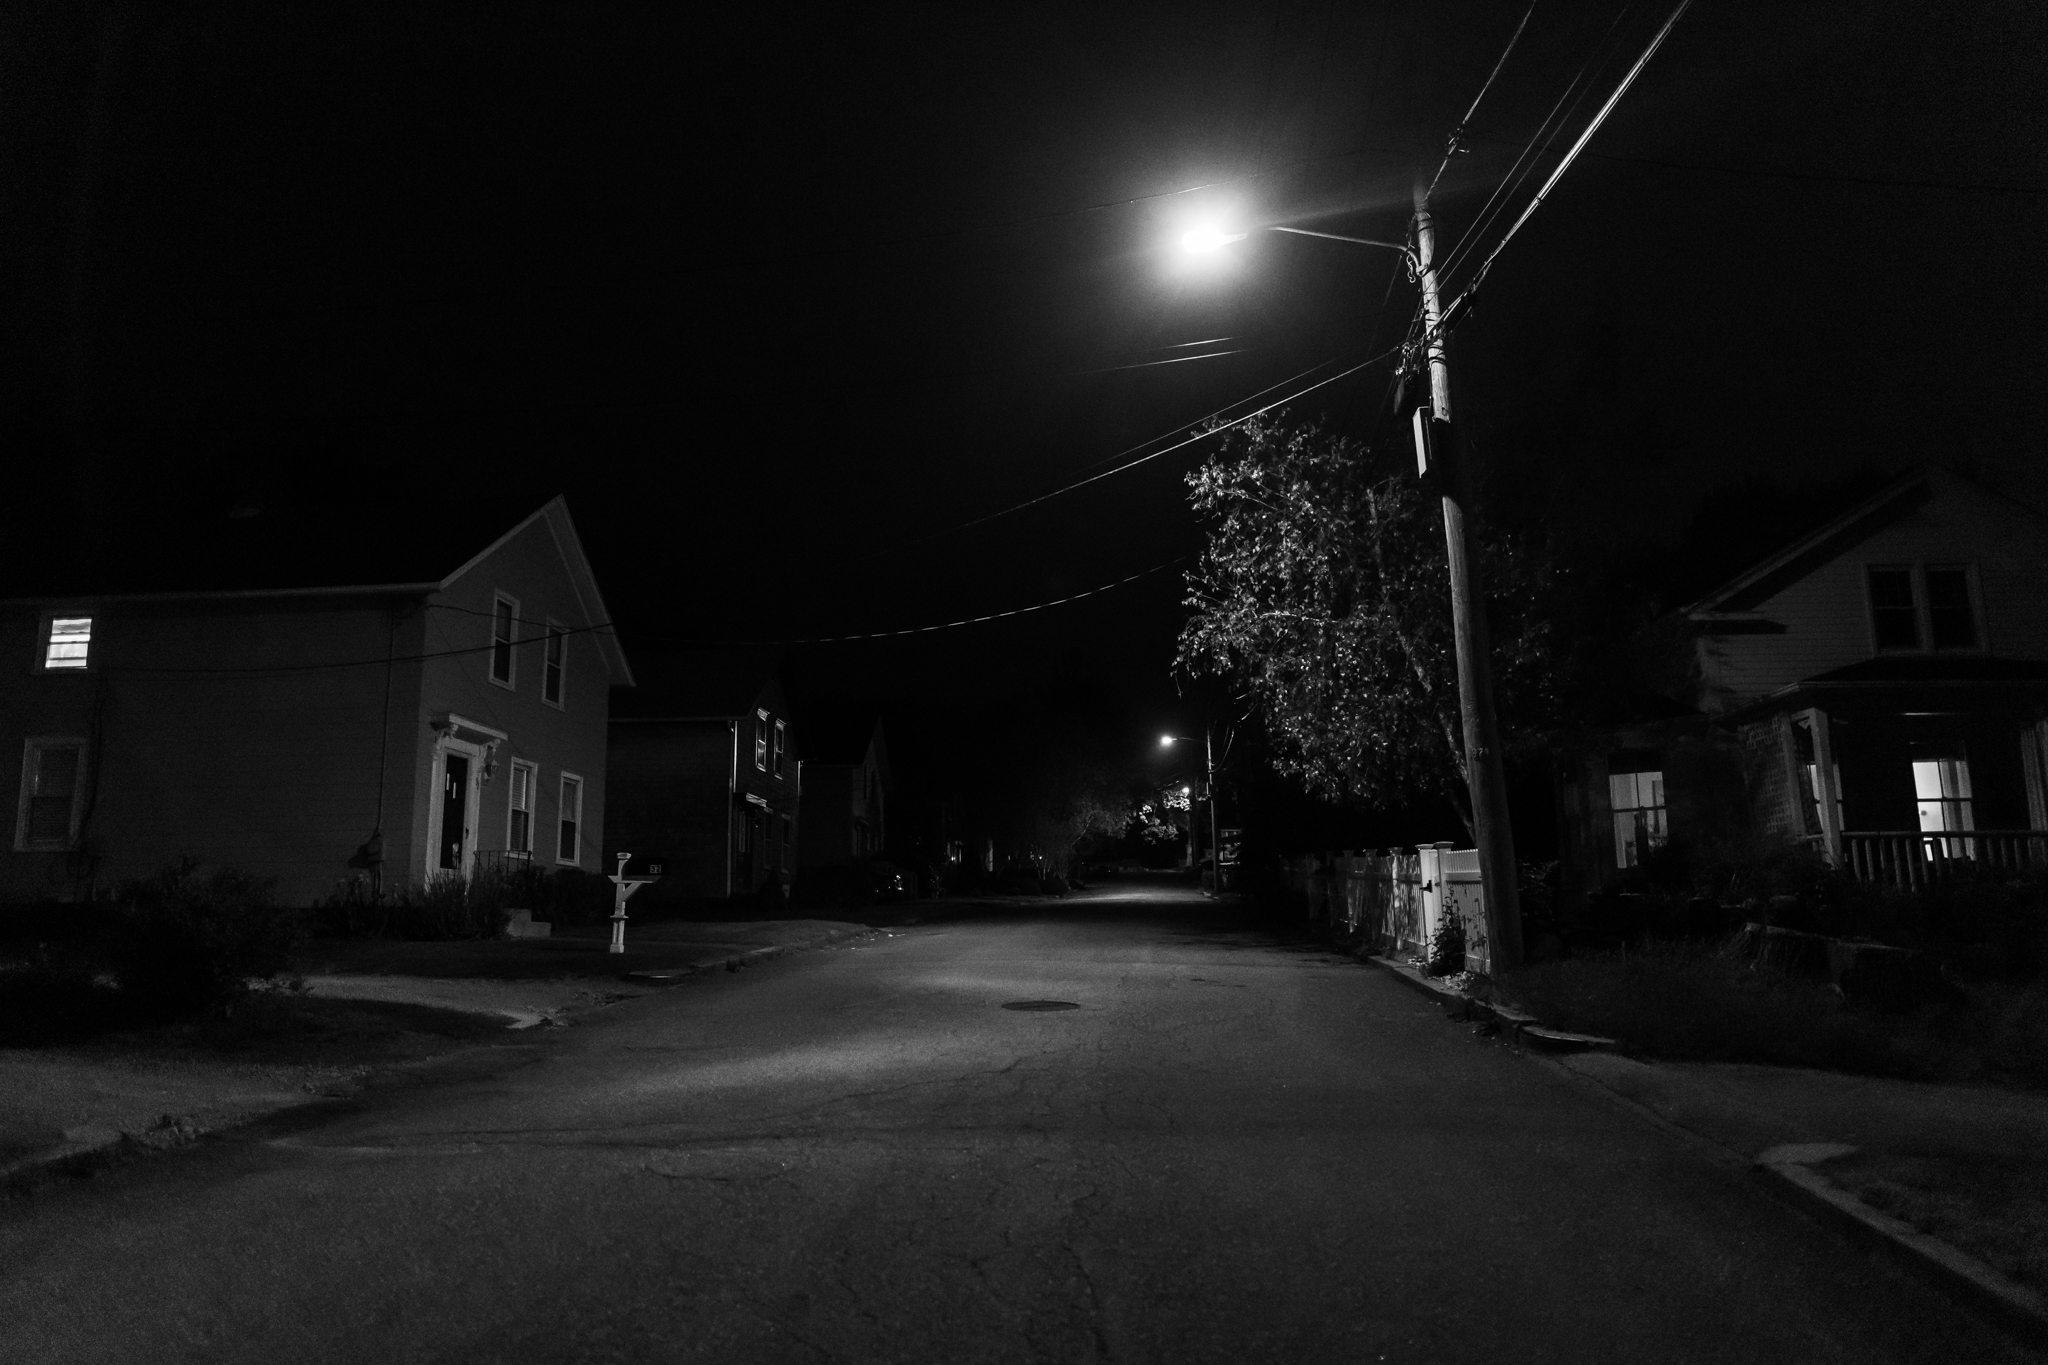 Schaeffer St. in Wakefield, RI at night